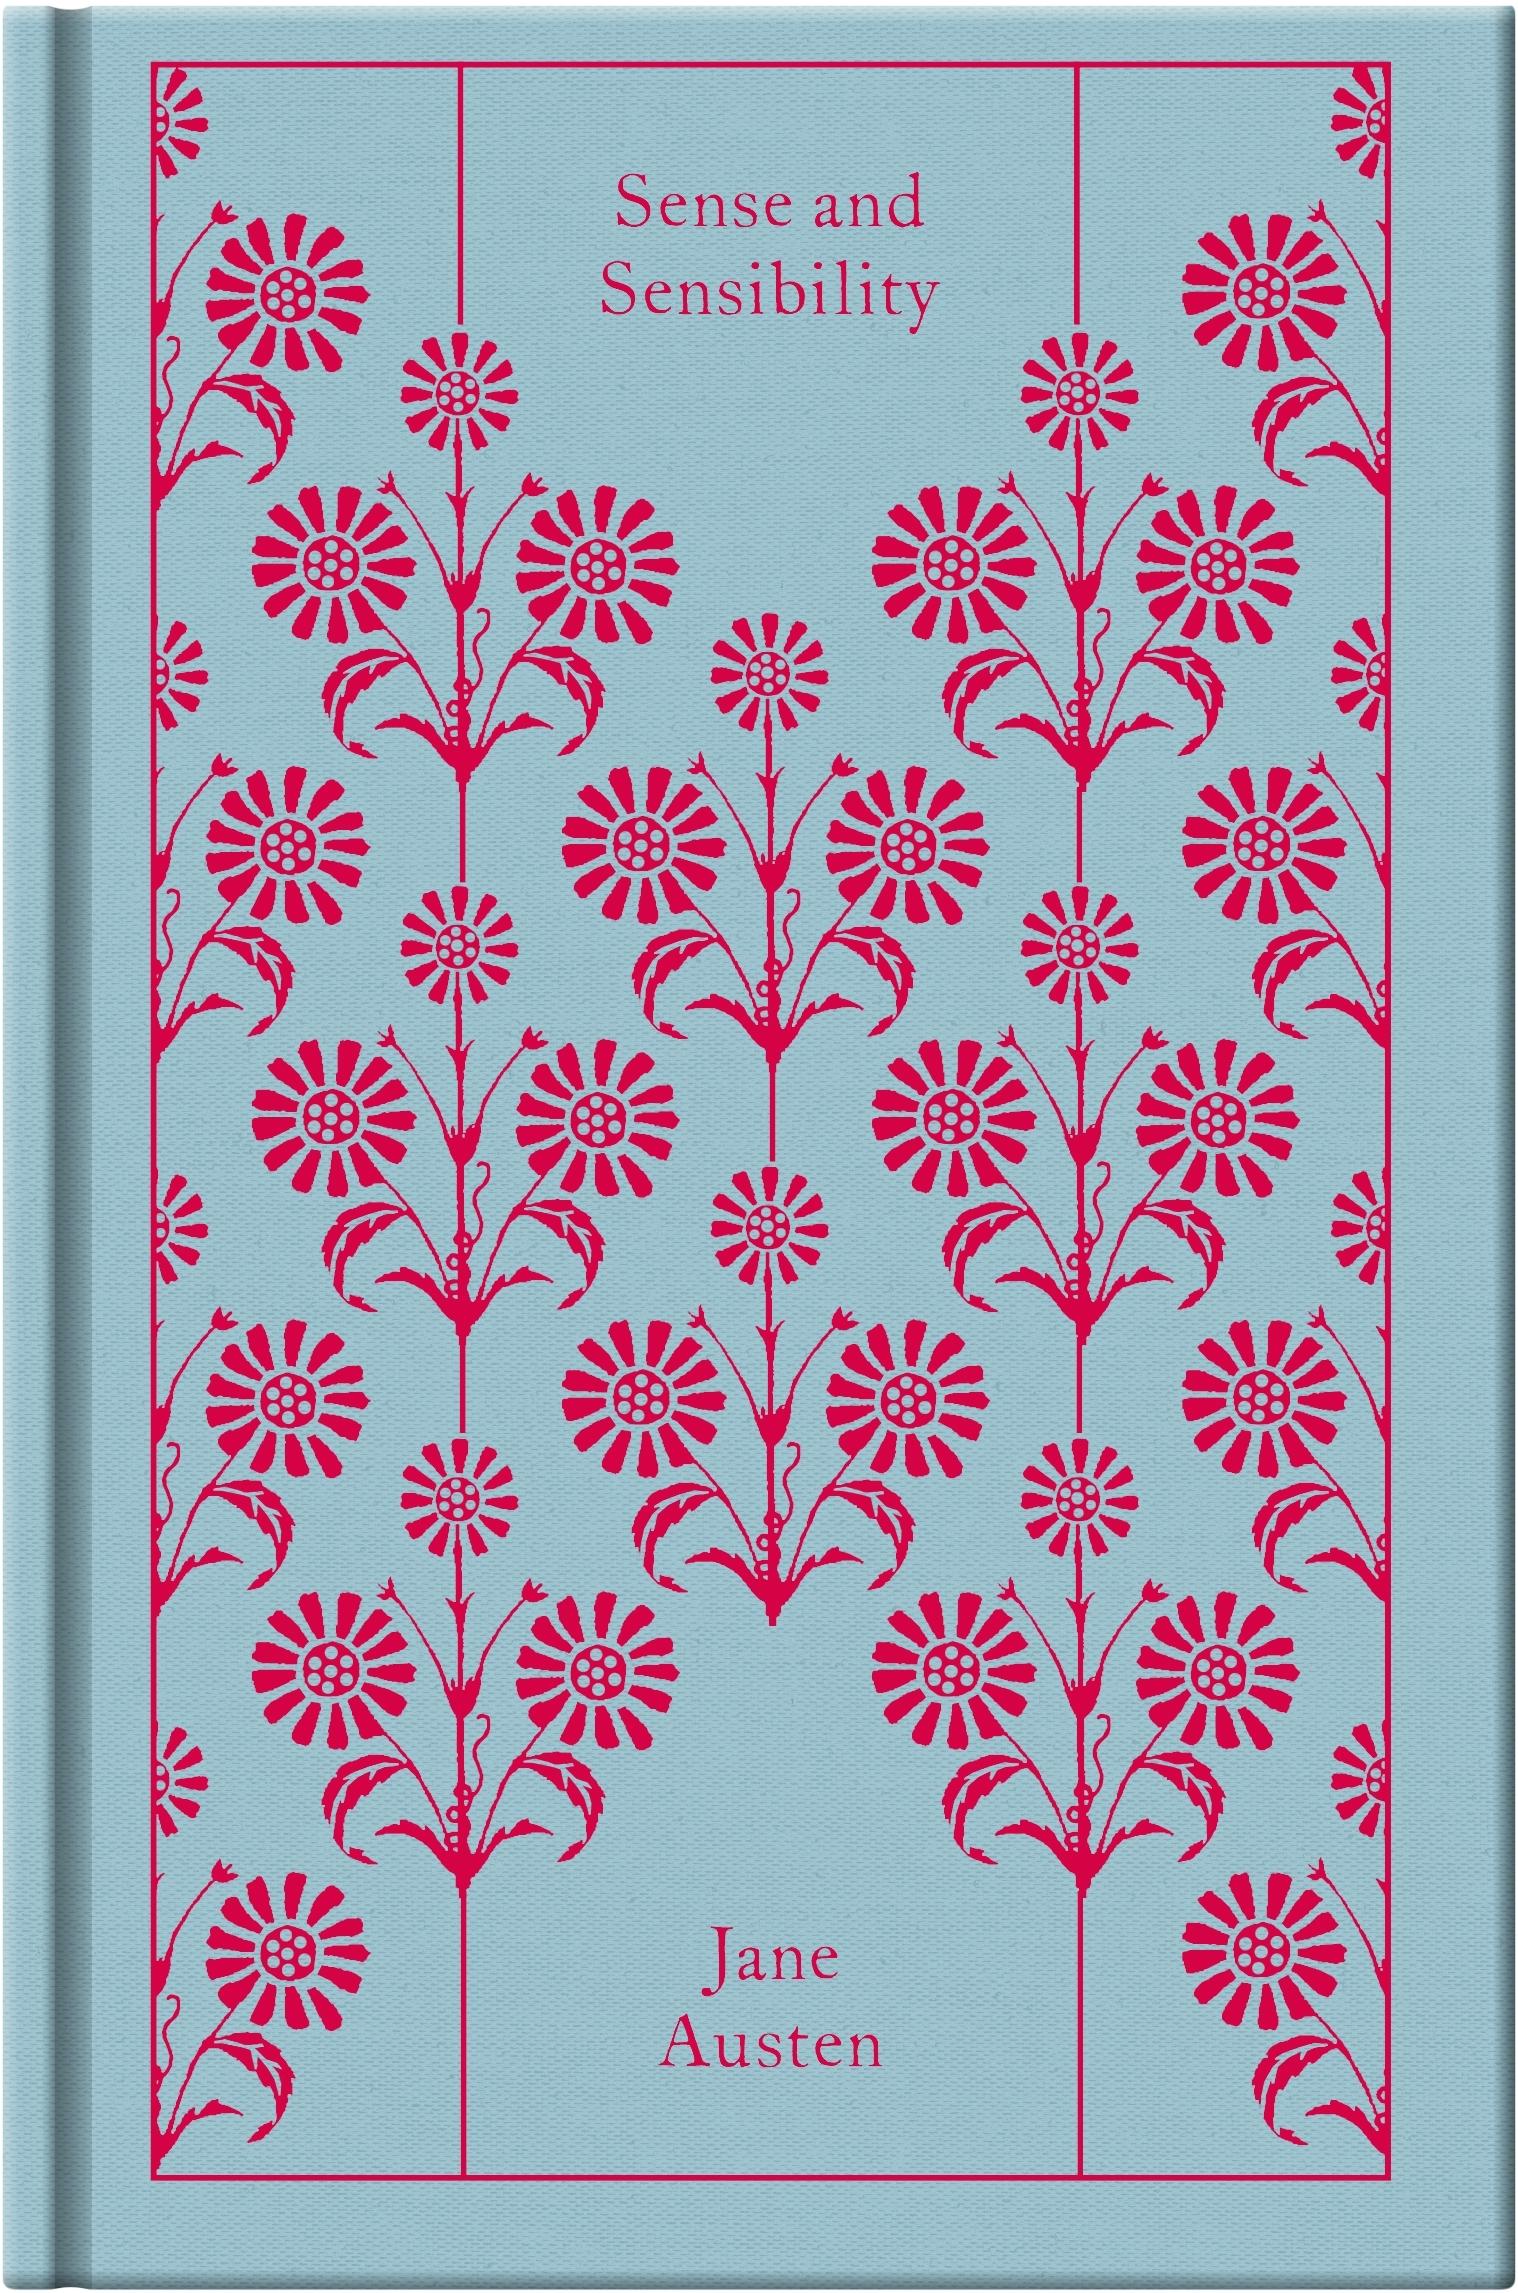 Jane Austen Pretty Book Covers : Sense and sensibility design by coralie bickford smith